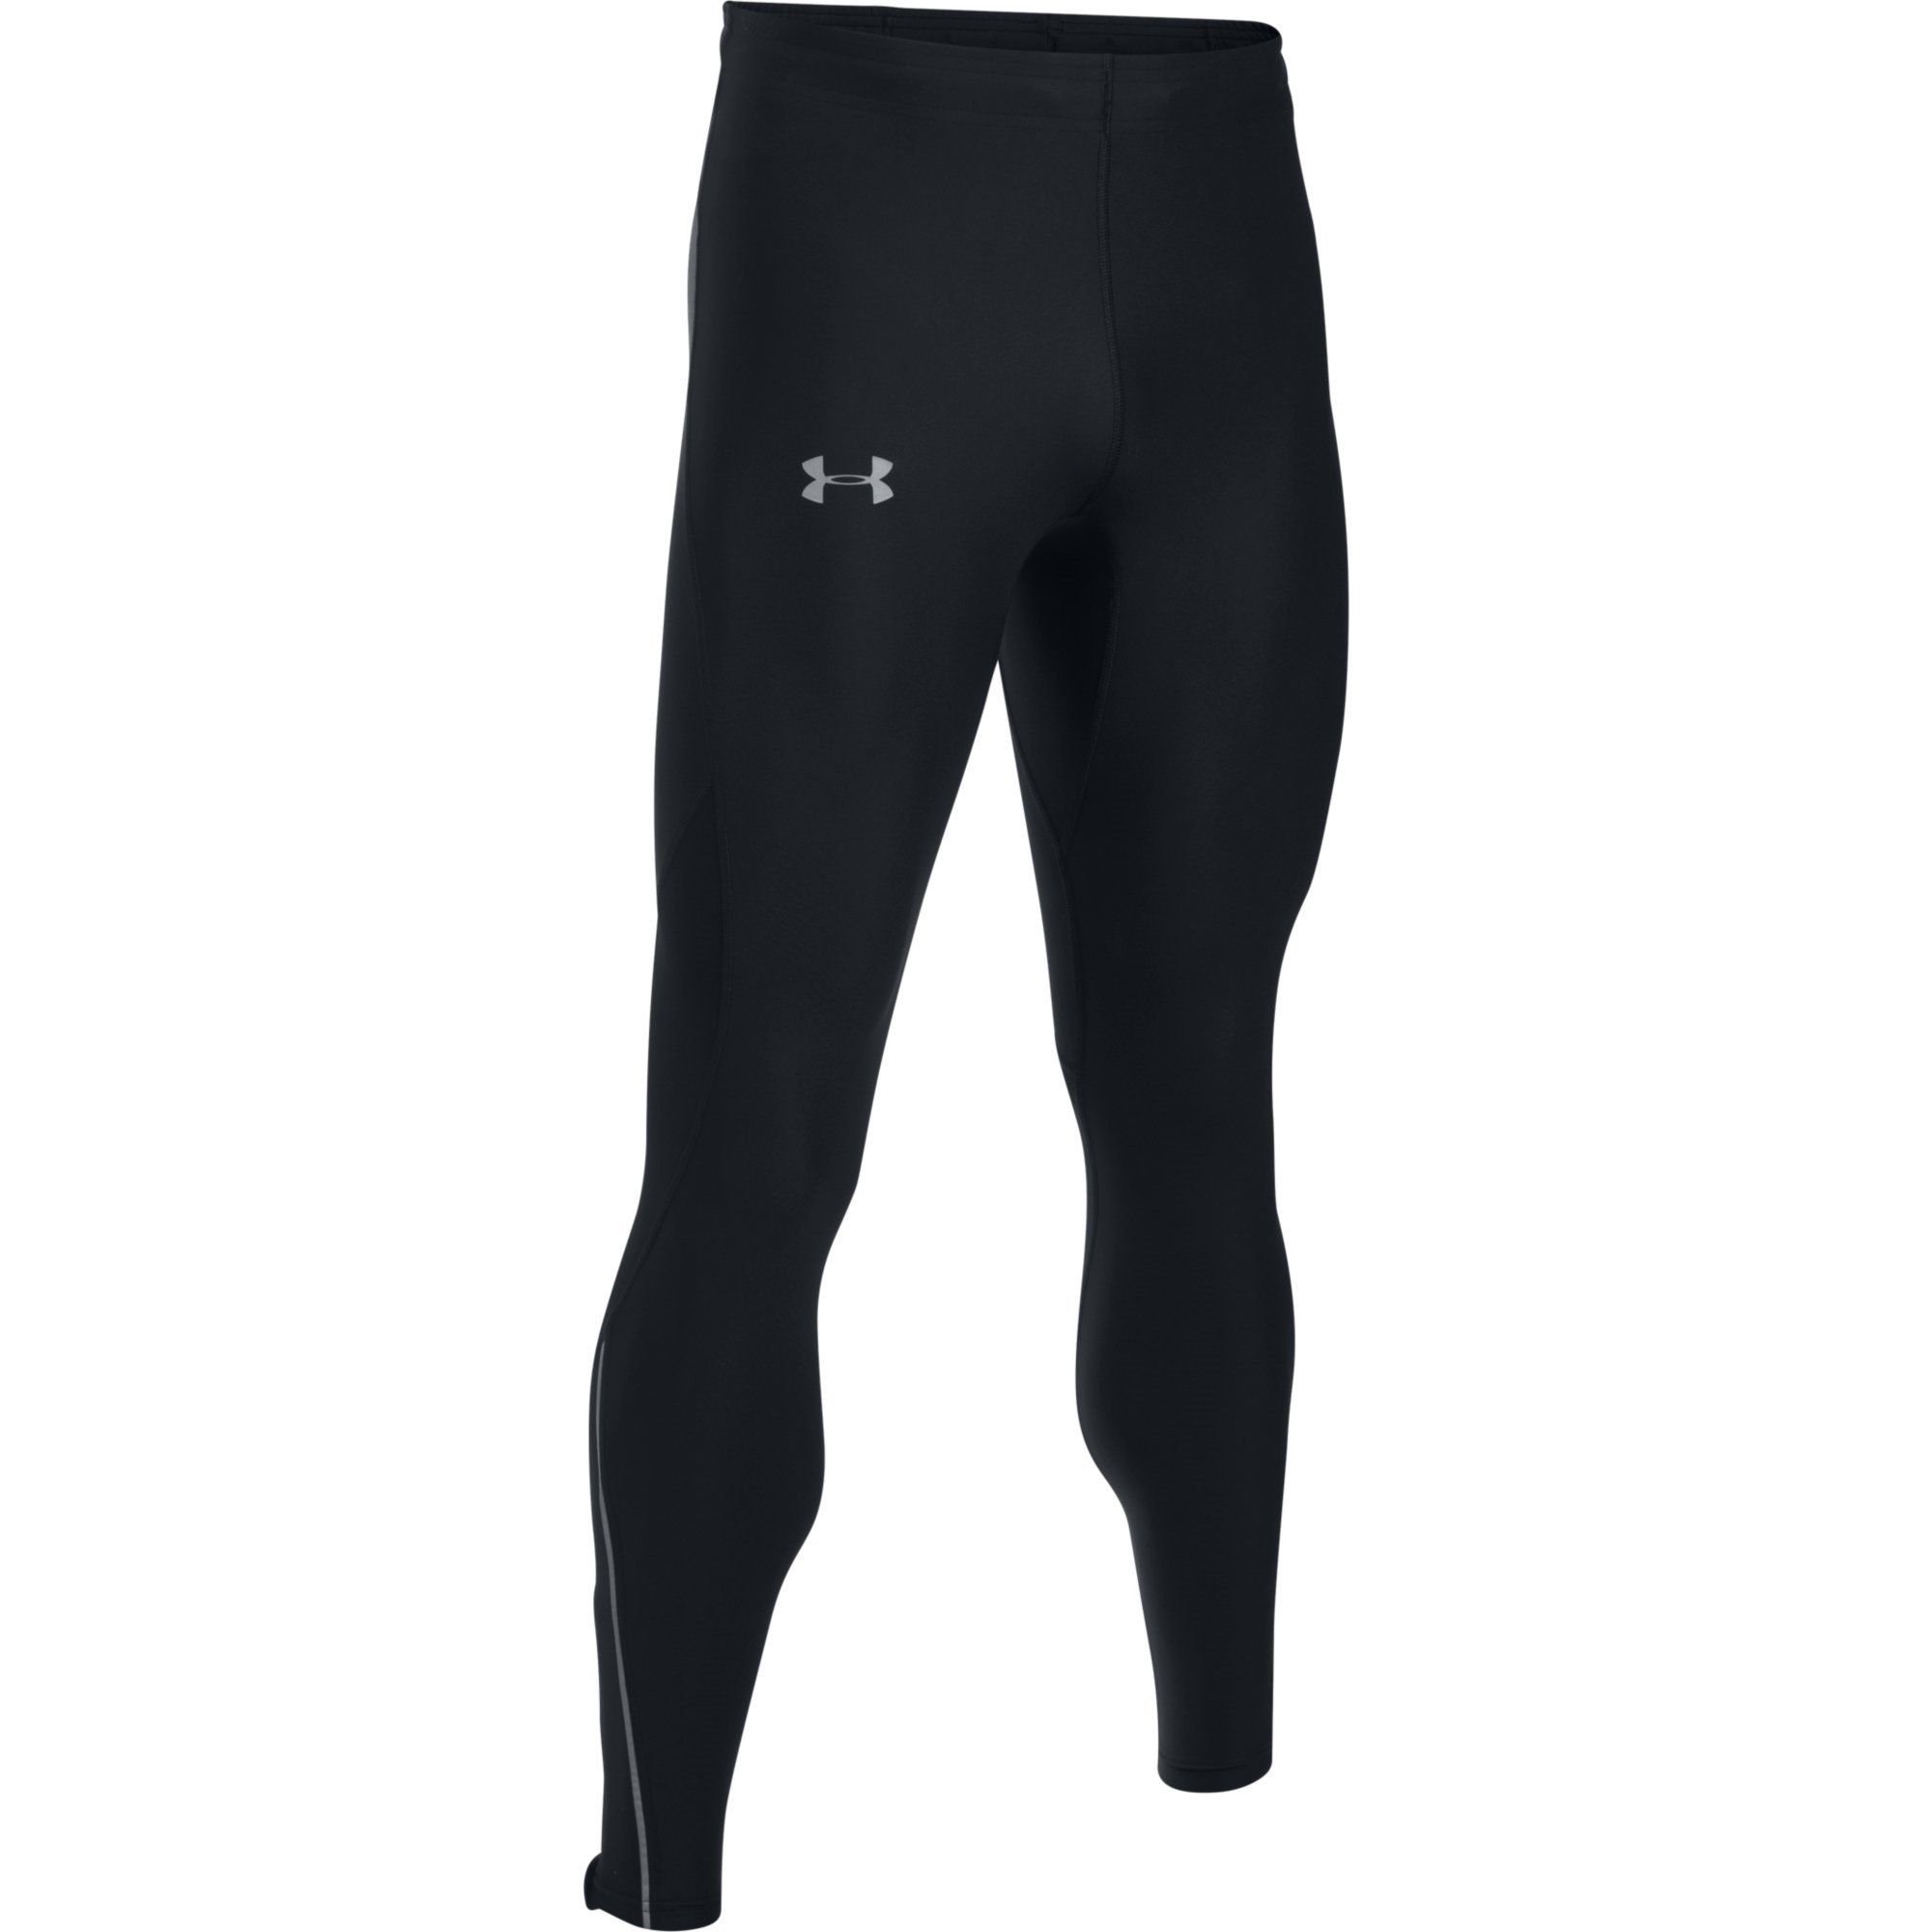 SKINS Men/'s DNAmic Compression Half Tights 1//2 Running Endurance Exercise Indigo